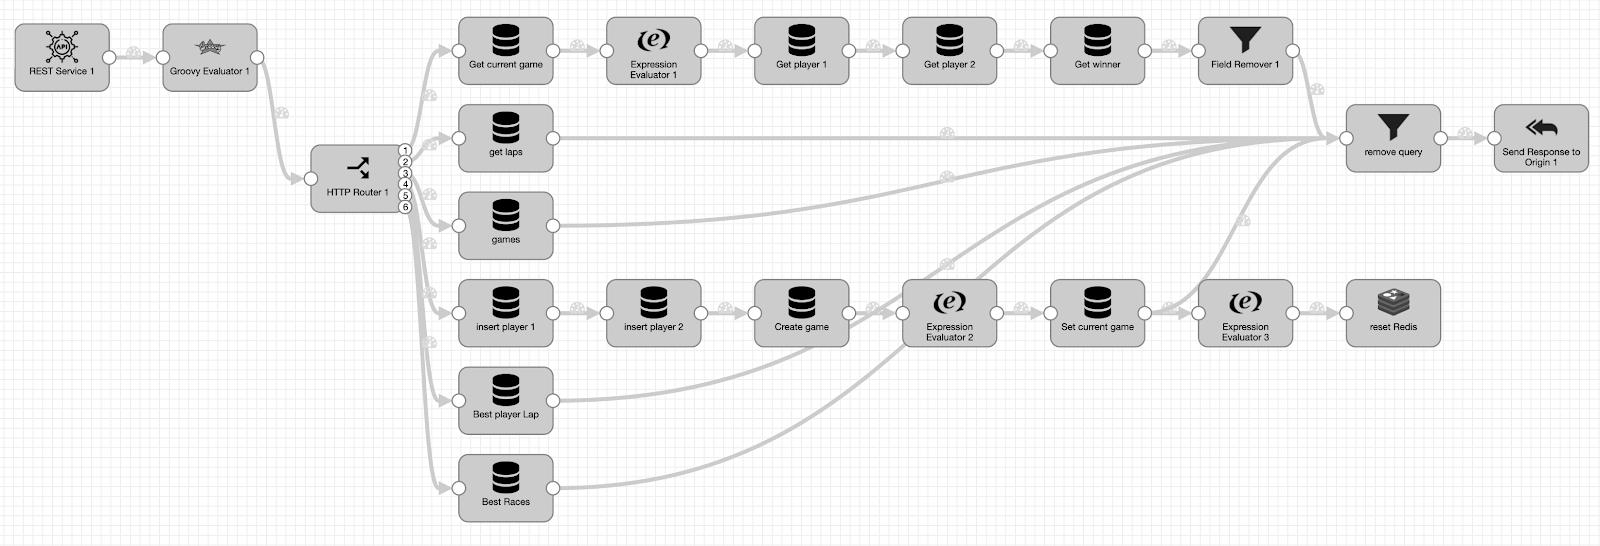 StreamSets Data Collector microservice pipeline